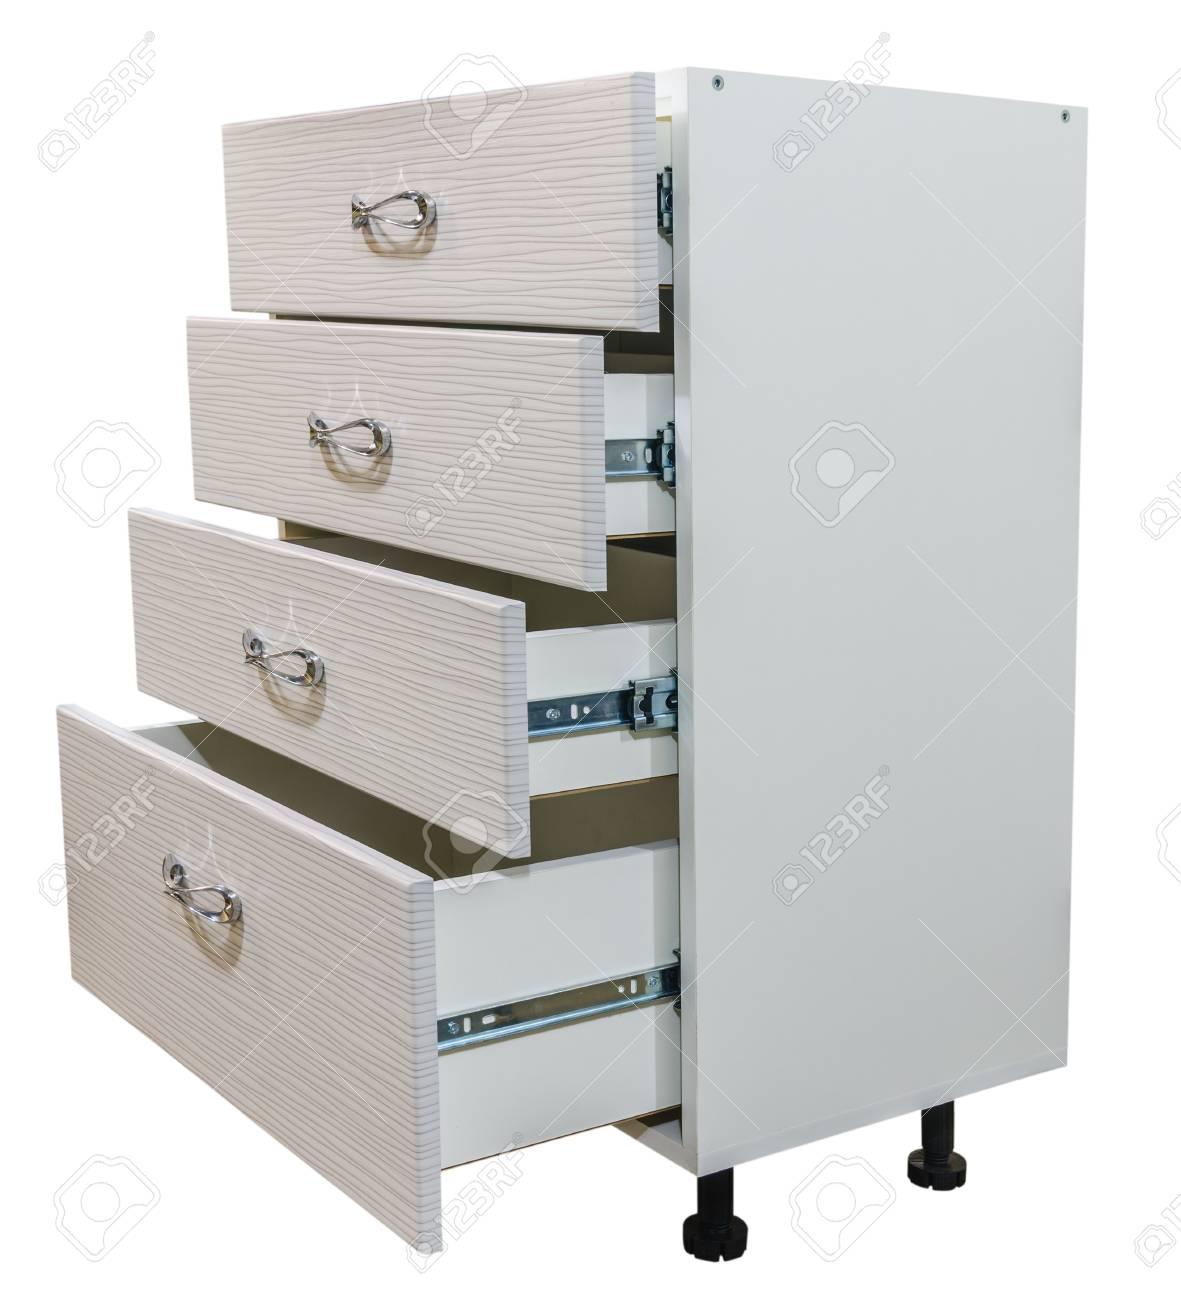 module furniture. Furniture Module Kitchen Cupboard On A White Background Isolate Stock Photo - 95079389